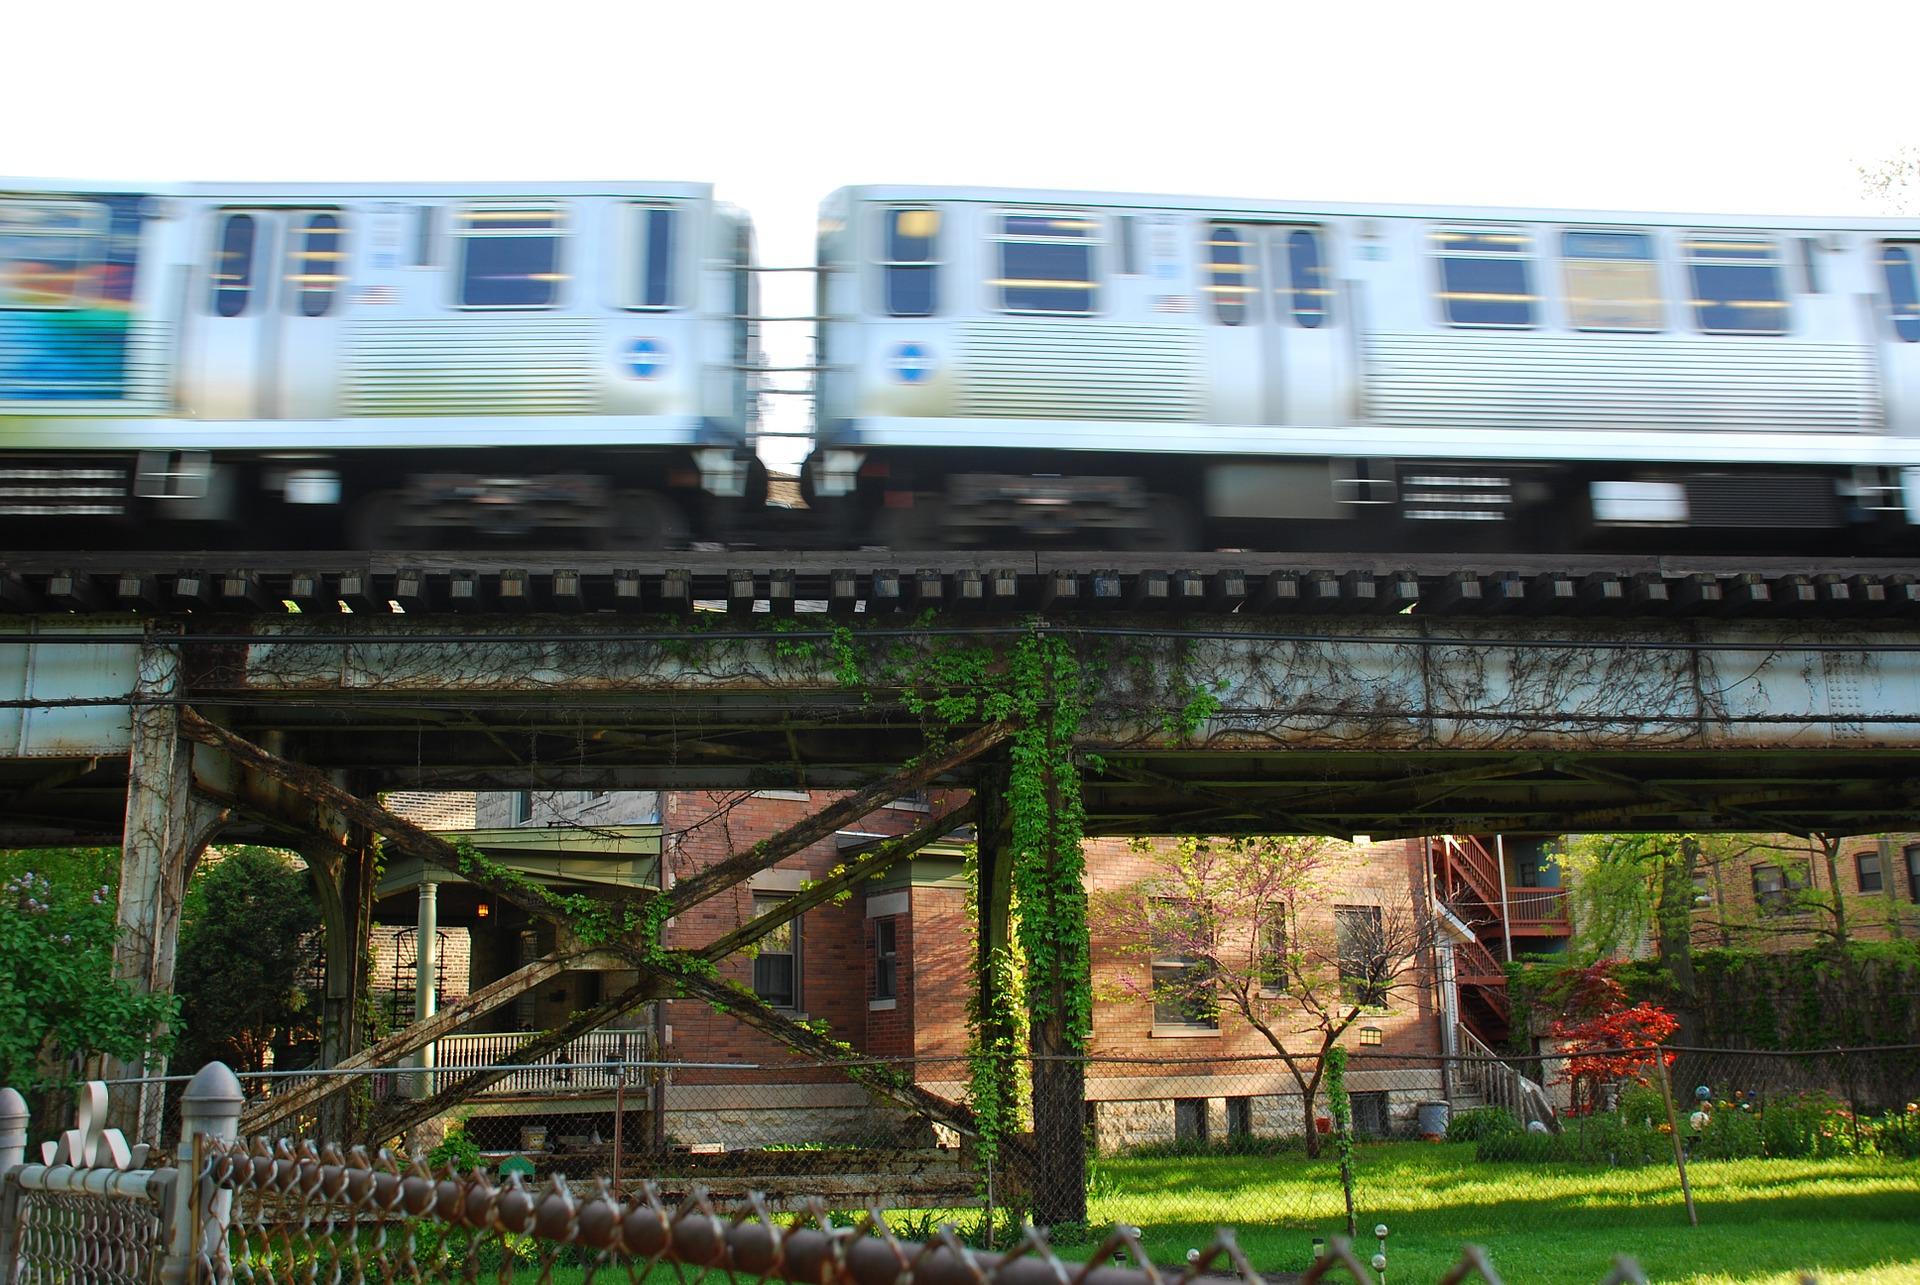 elevated l train yo